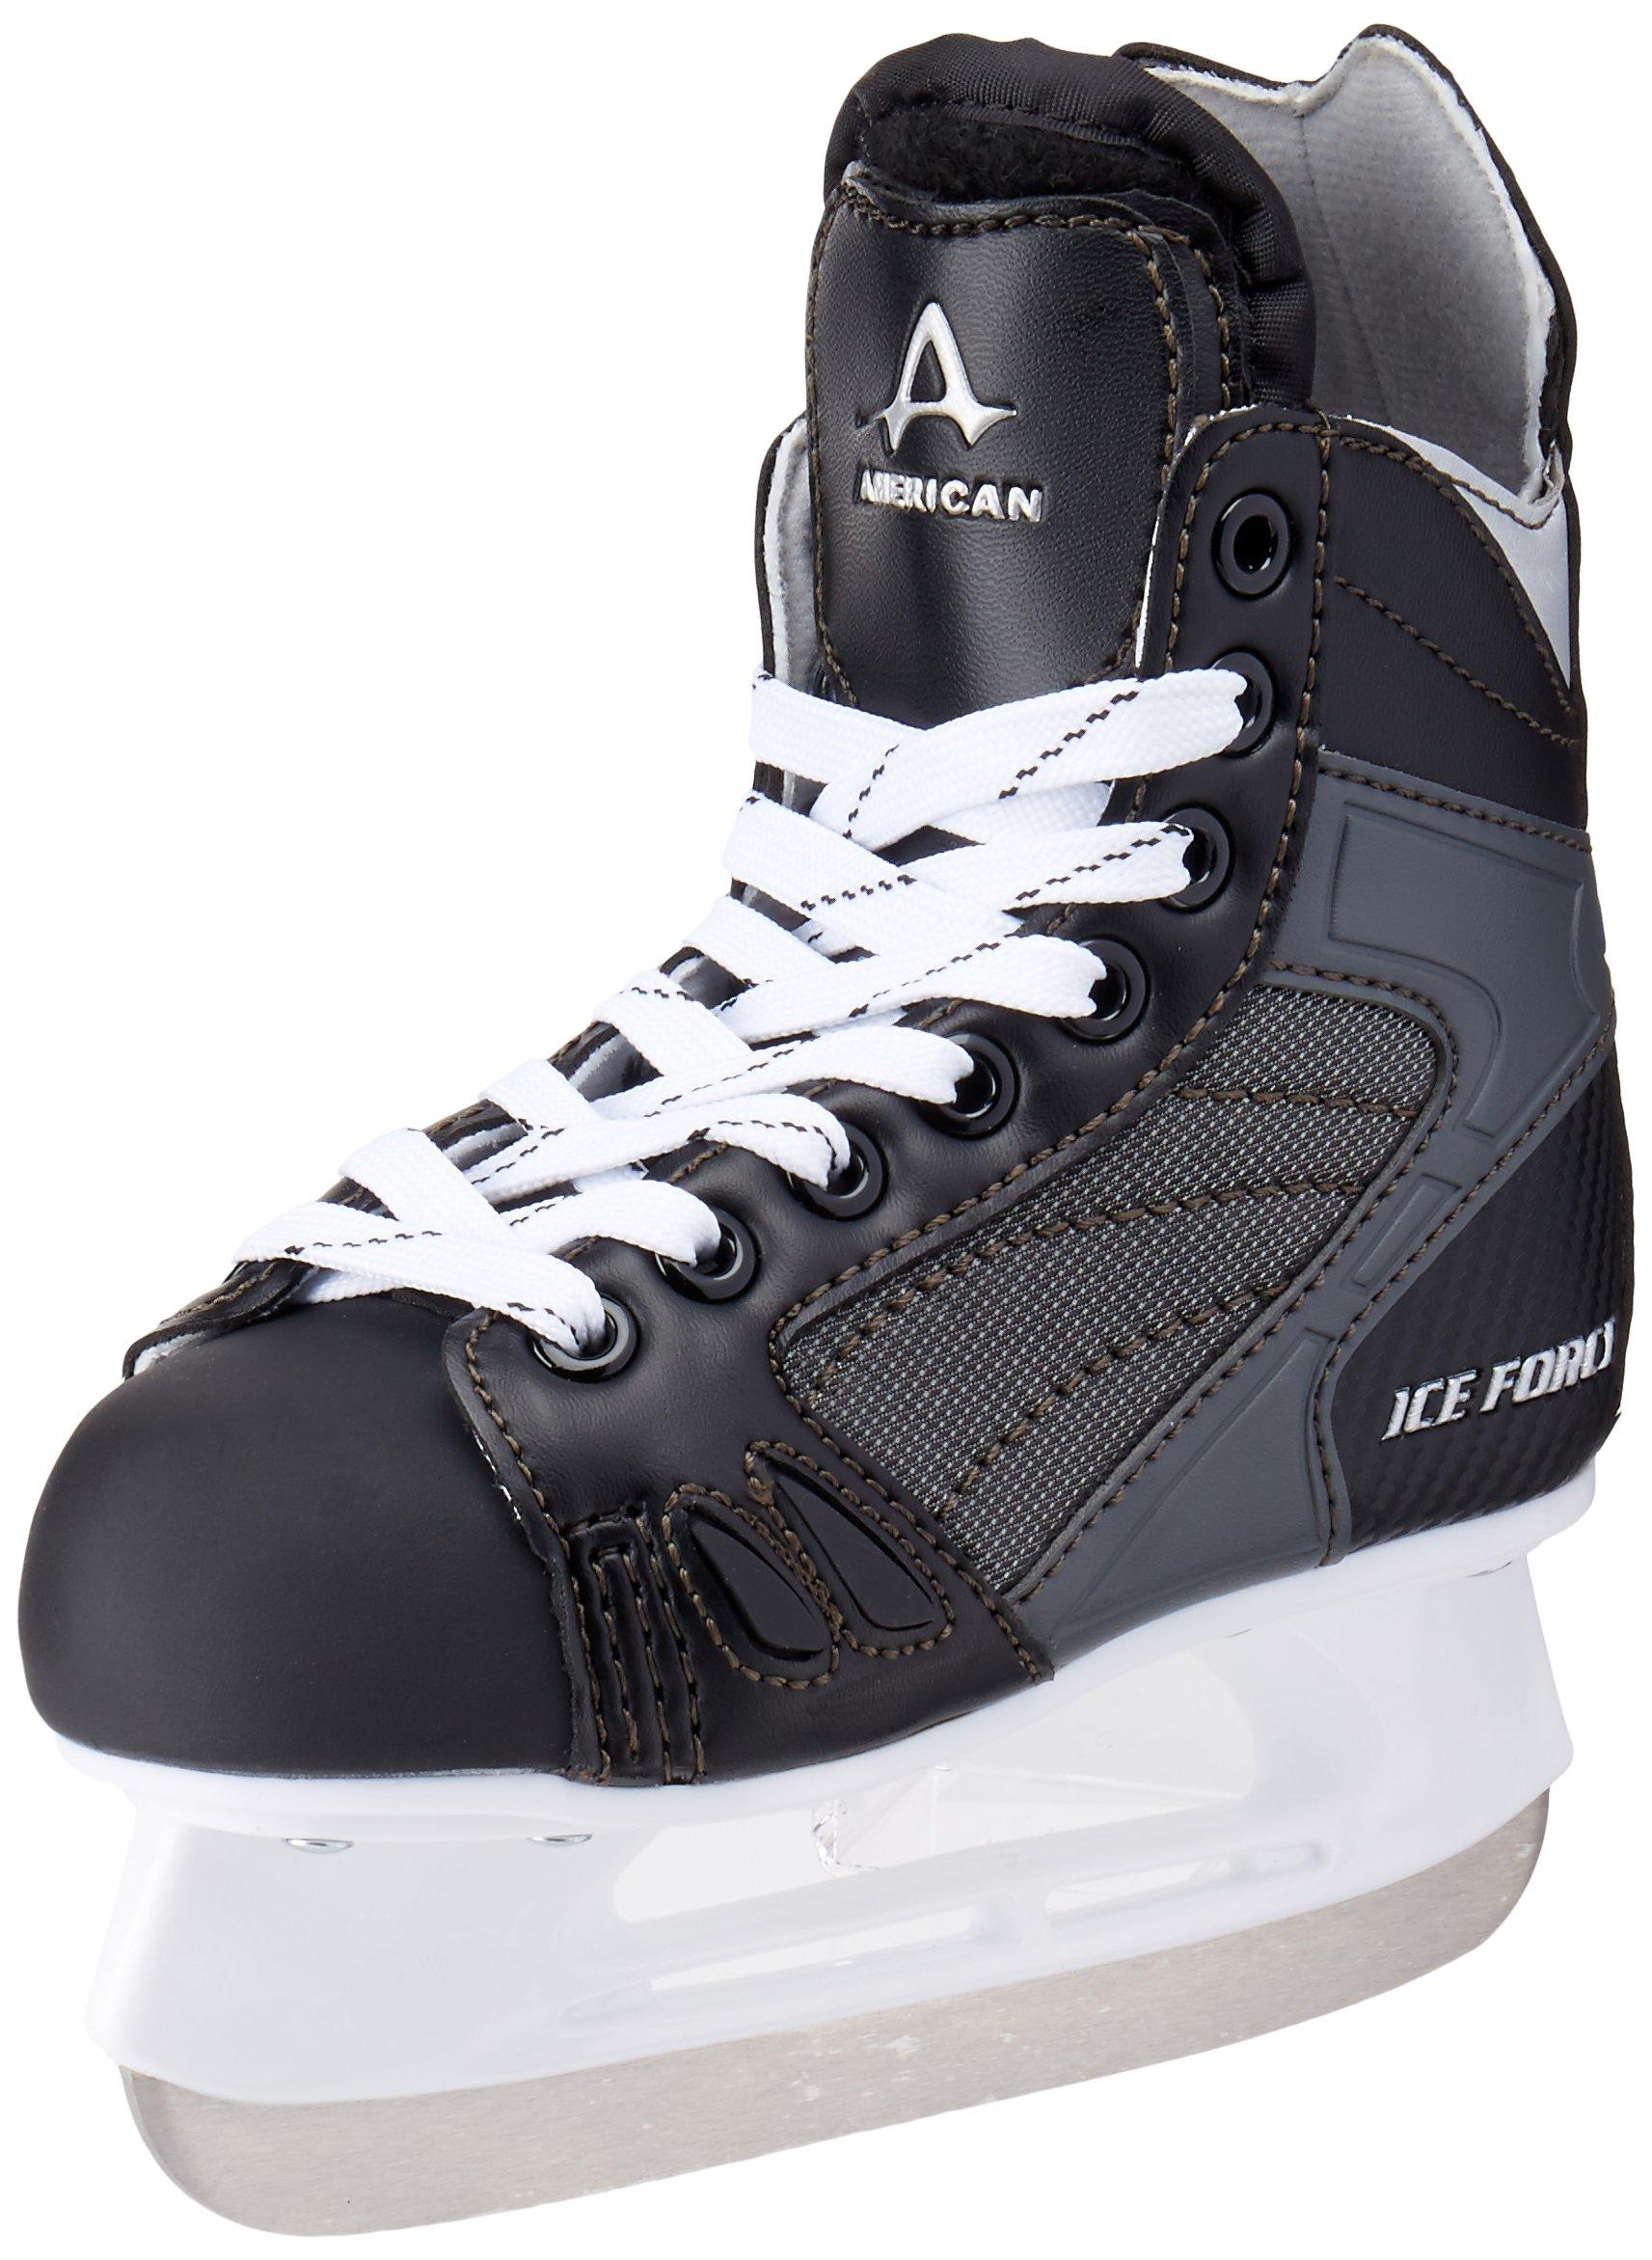 American Athletic Shoe Boy's Ice Force Hockey Skates, Black, 10 Y